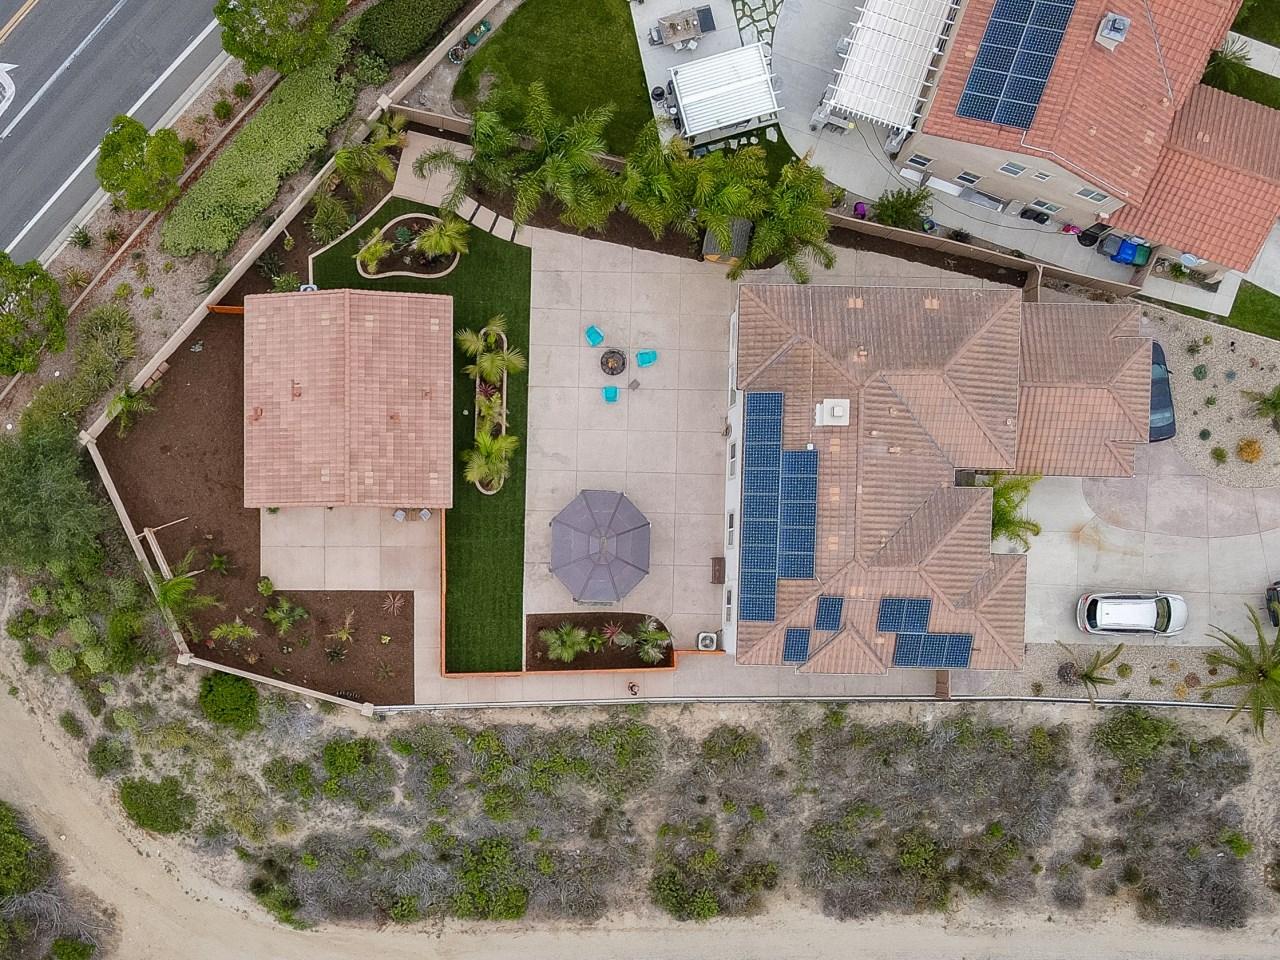 SnapAdu-Oceanside-Toopal-2BR-1BA-ADU-drone-photo-aerial-property